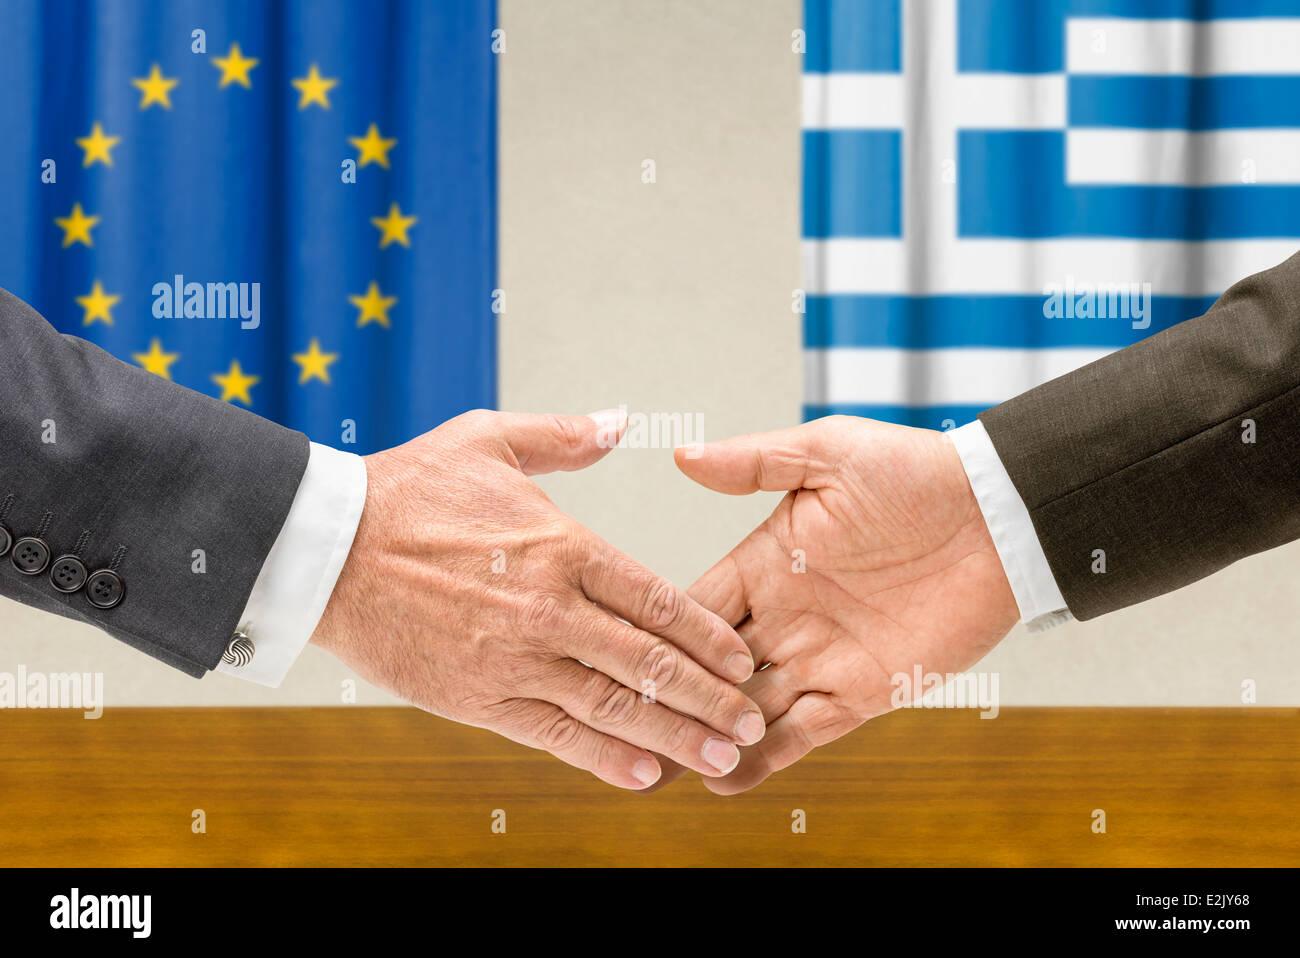 Greece Handshake Stock Photos Greece Handshake Stock Images Alamy